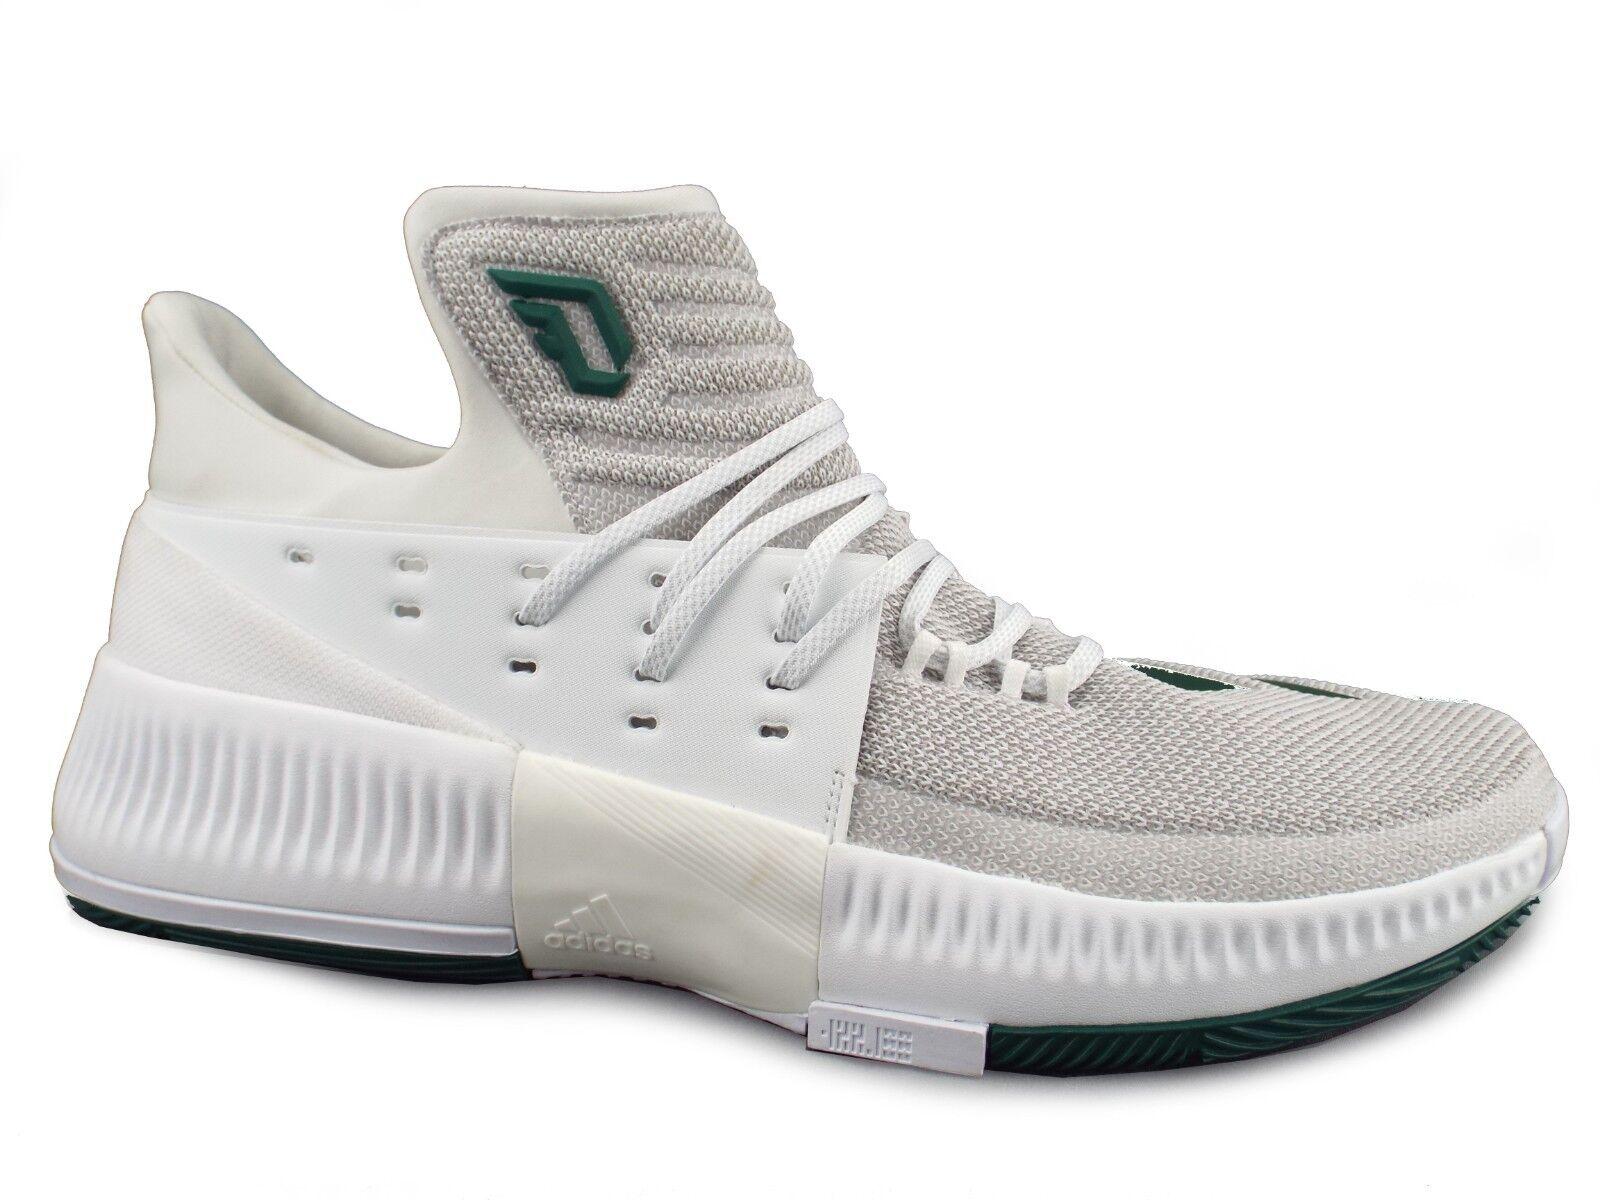 NEW Adidas Dame 3 Damian Lillard Men's 17 White Green Basketball Athletic shoes